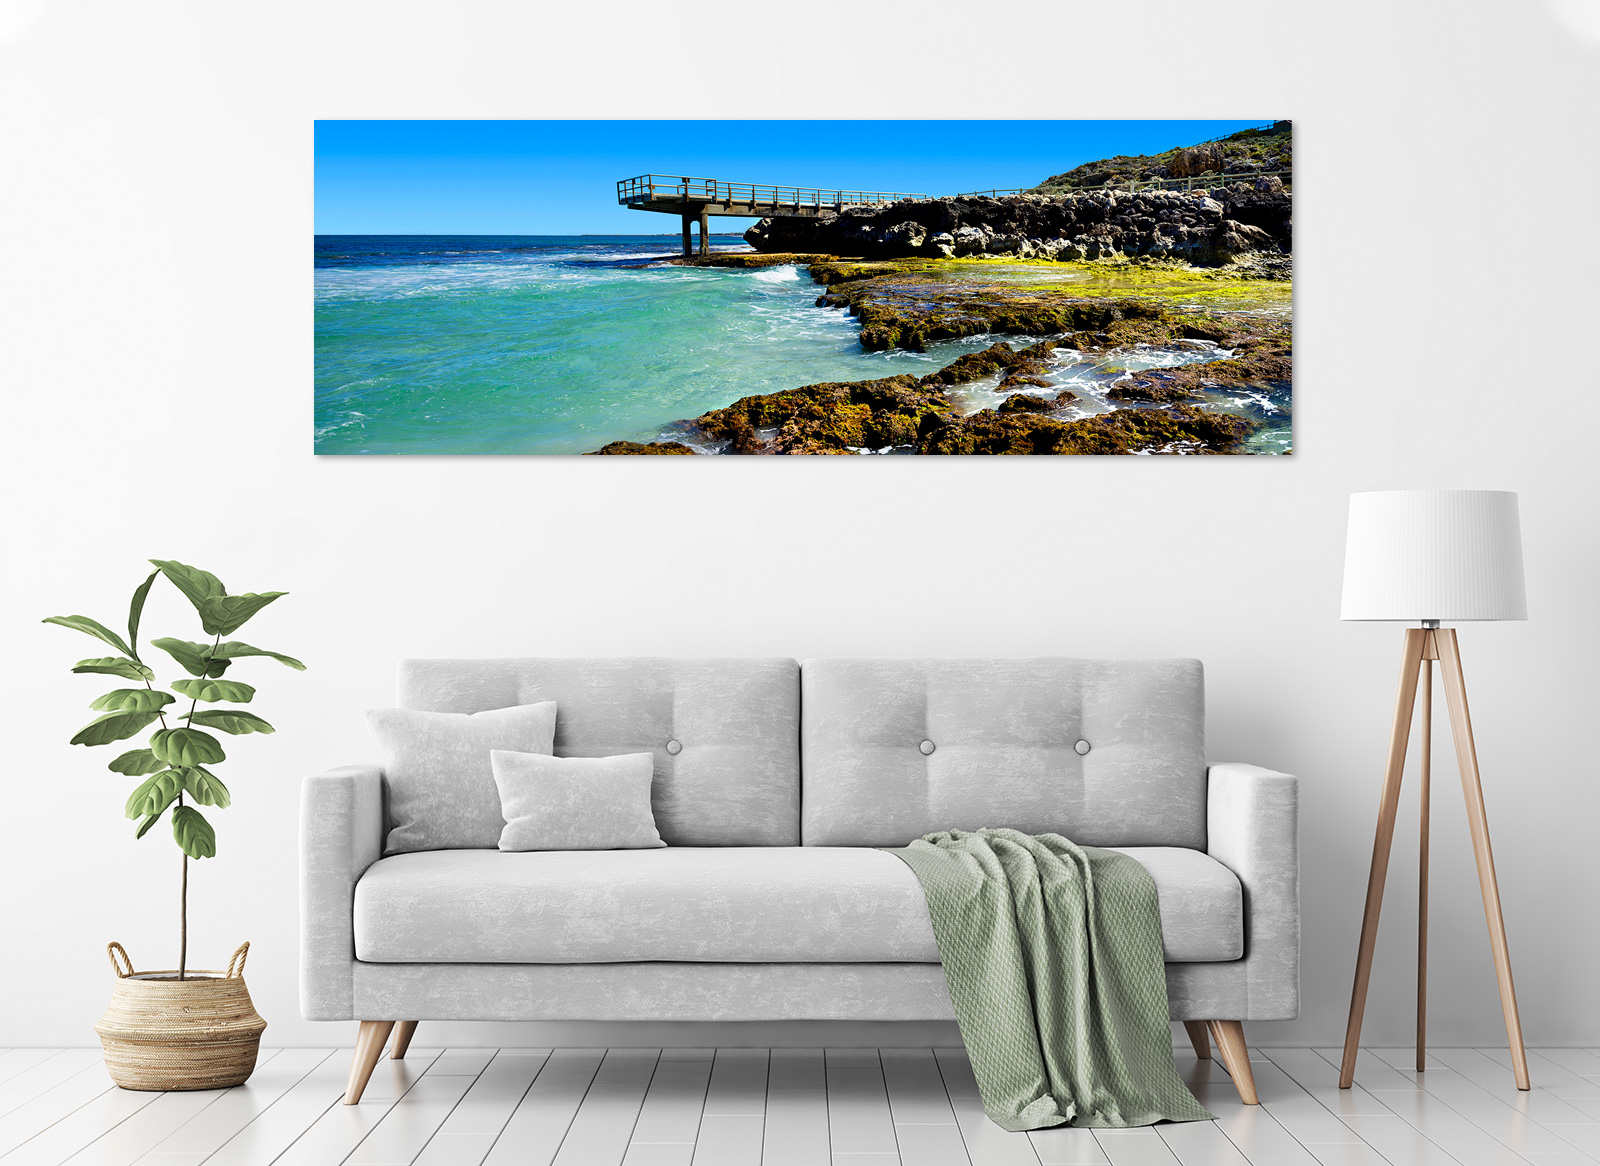 Jason Mazur - 'North Beach Groyne 001' in a room